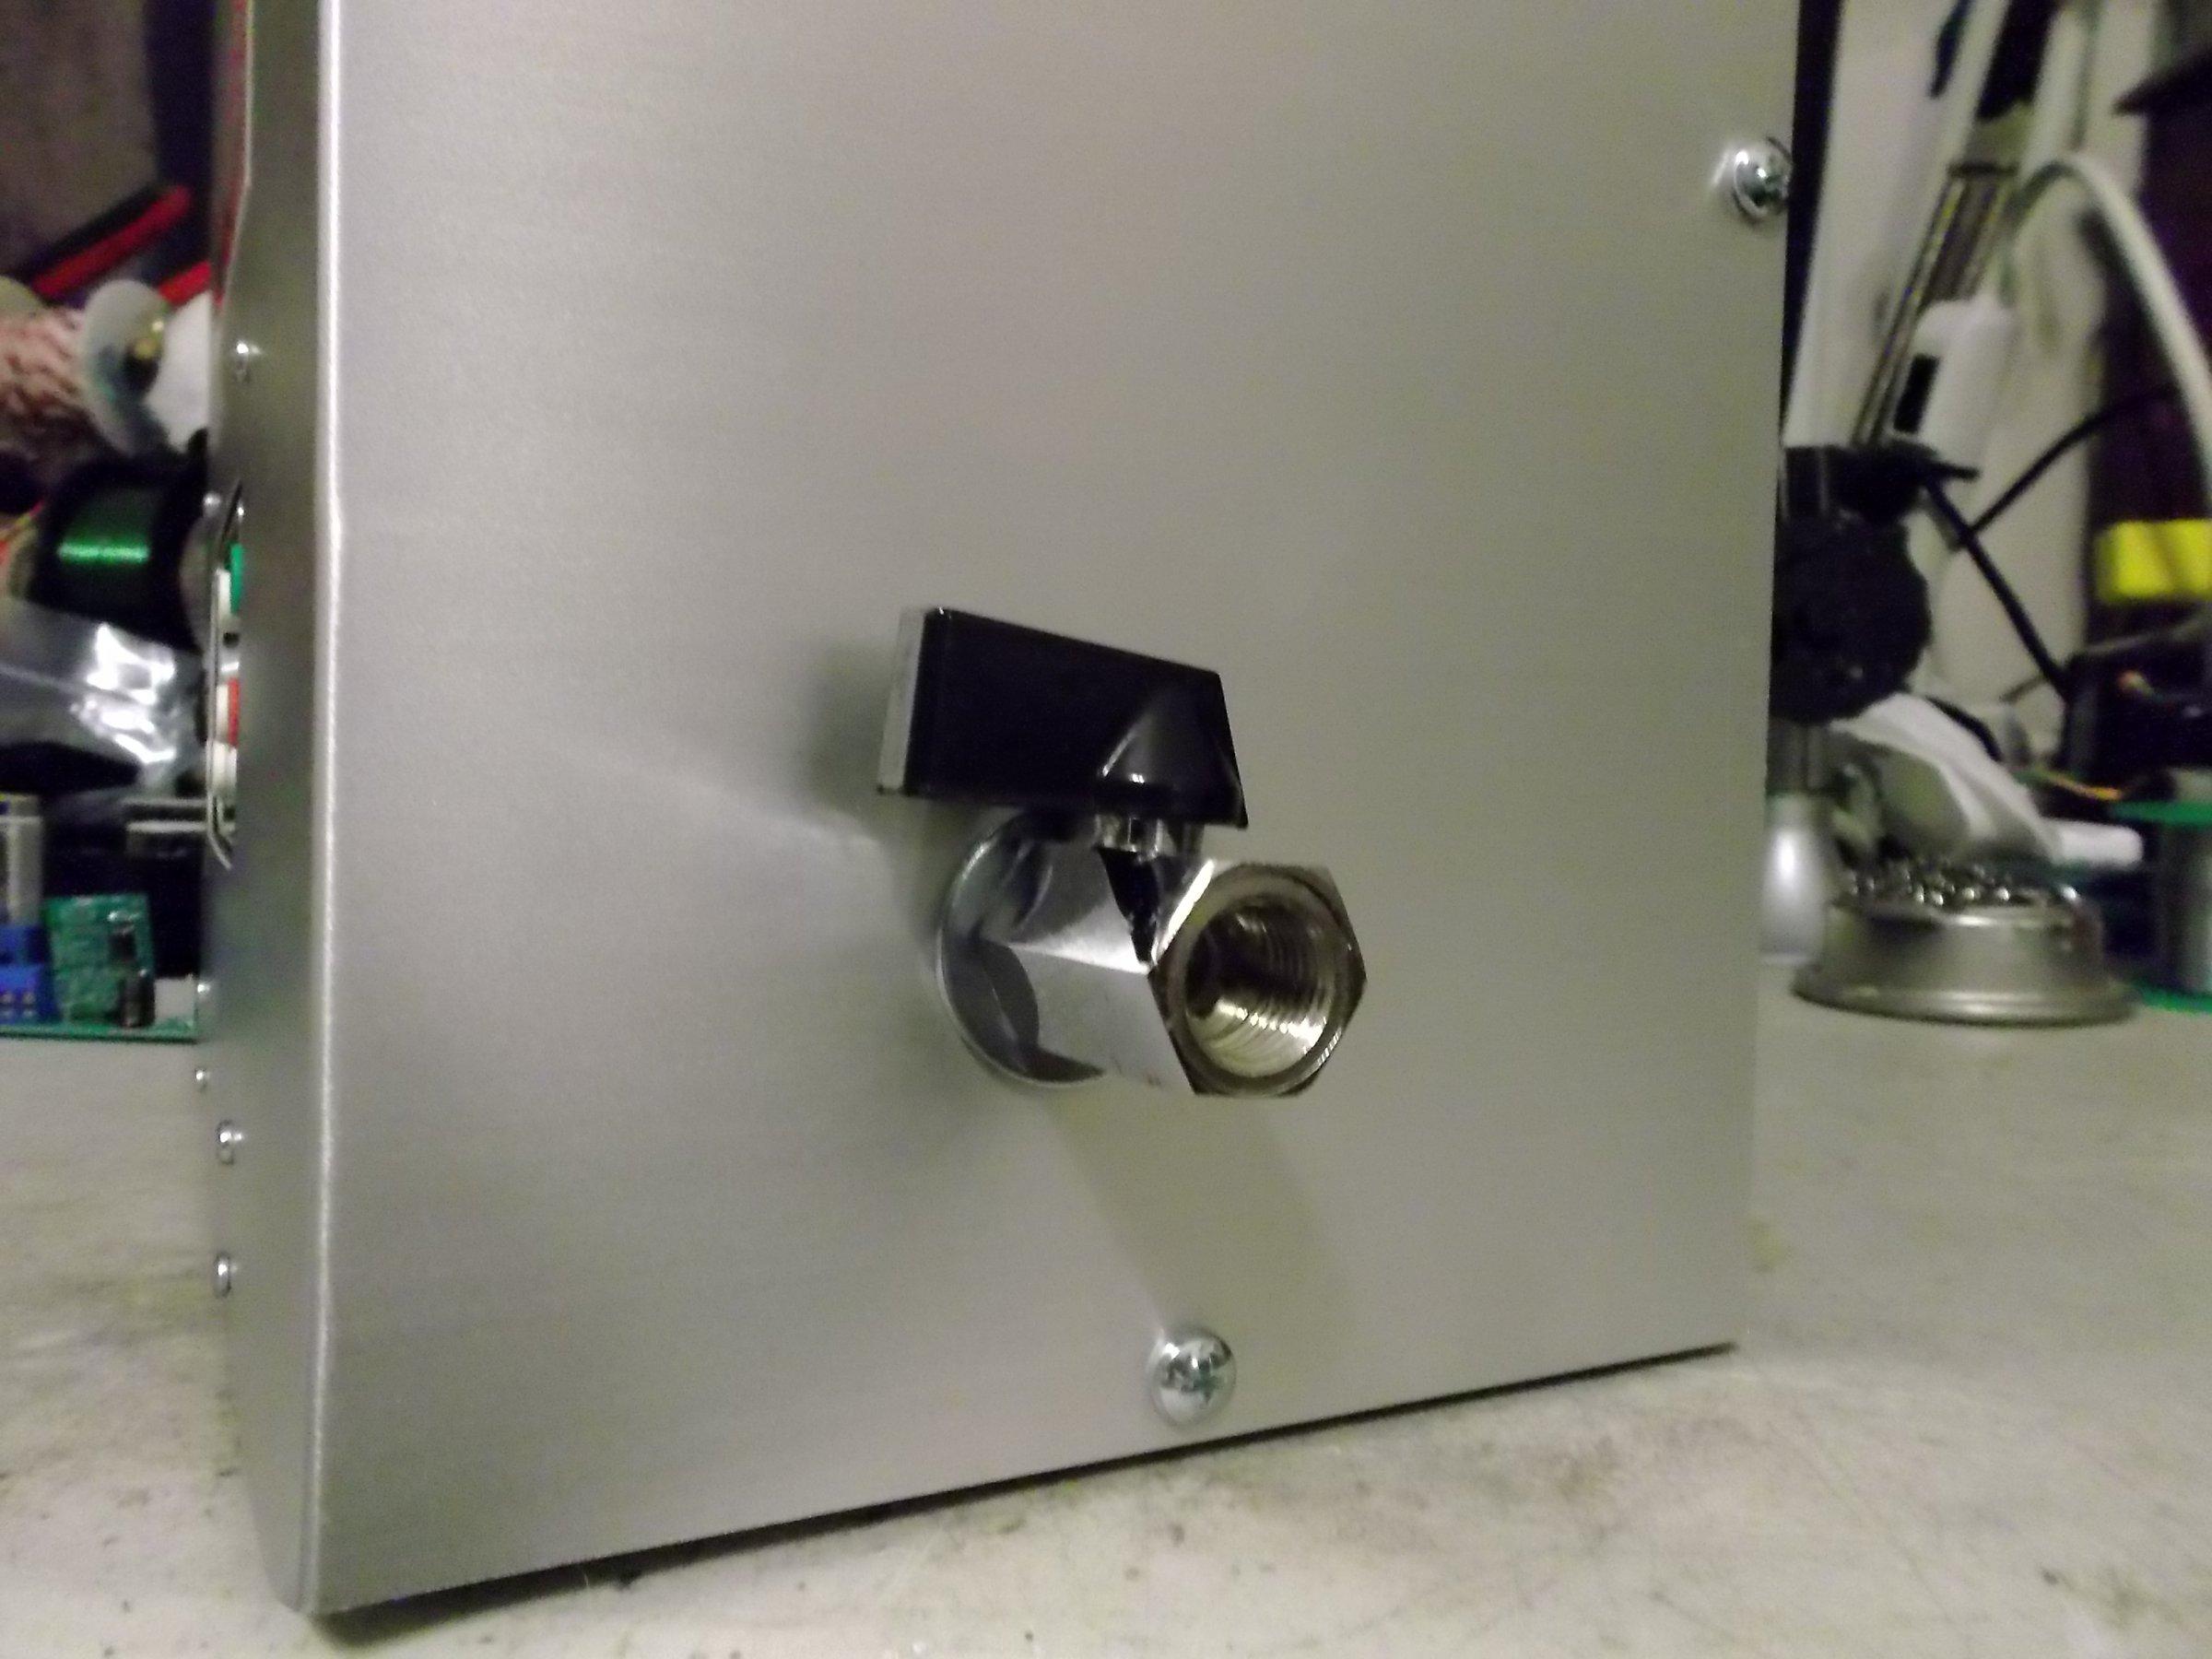 Vibrato 6 Quart 80khz Ultrasonic Cleaner From Llc On Tindie Products Generators Generator Circuit 5